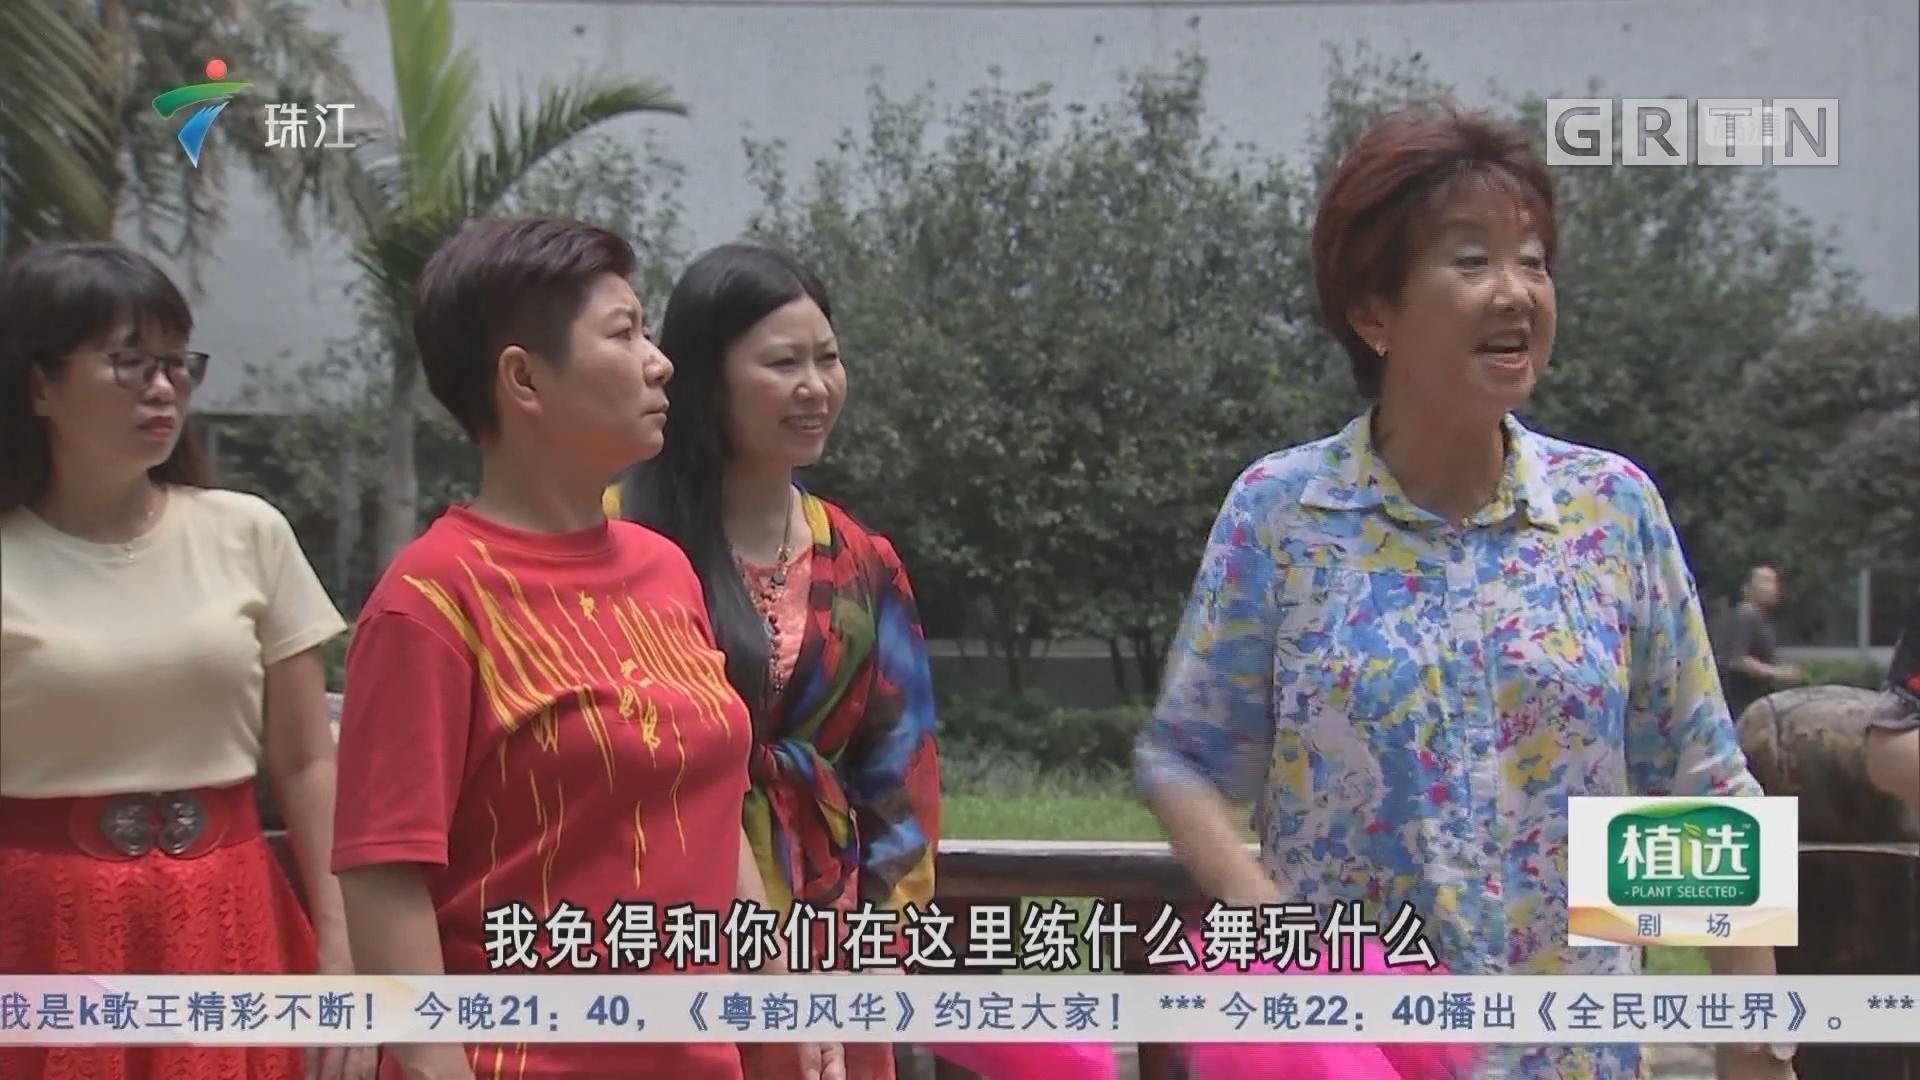 [HD][2018-11-25]外来媳妇本地郎:广场舞风云(上)